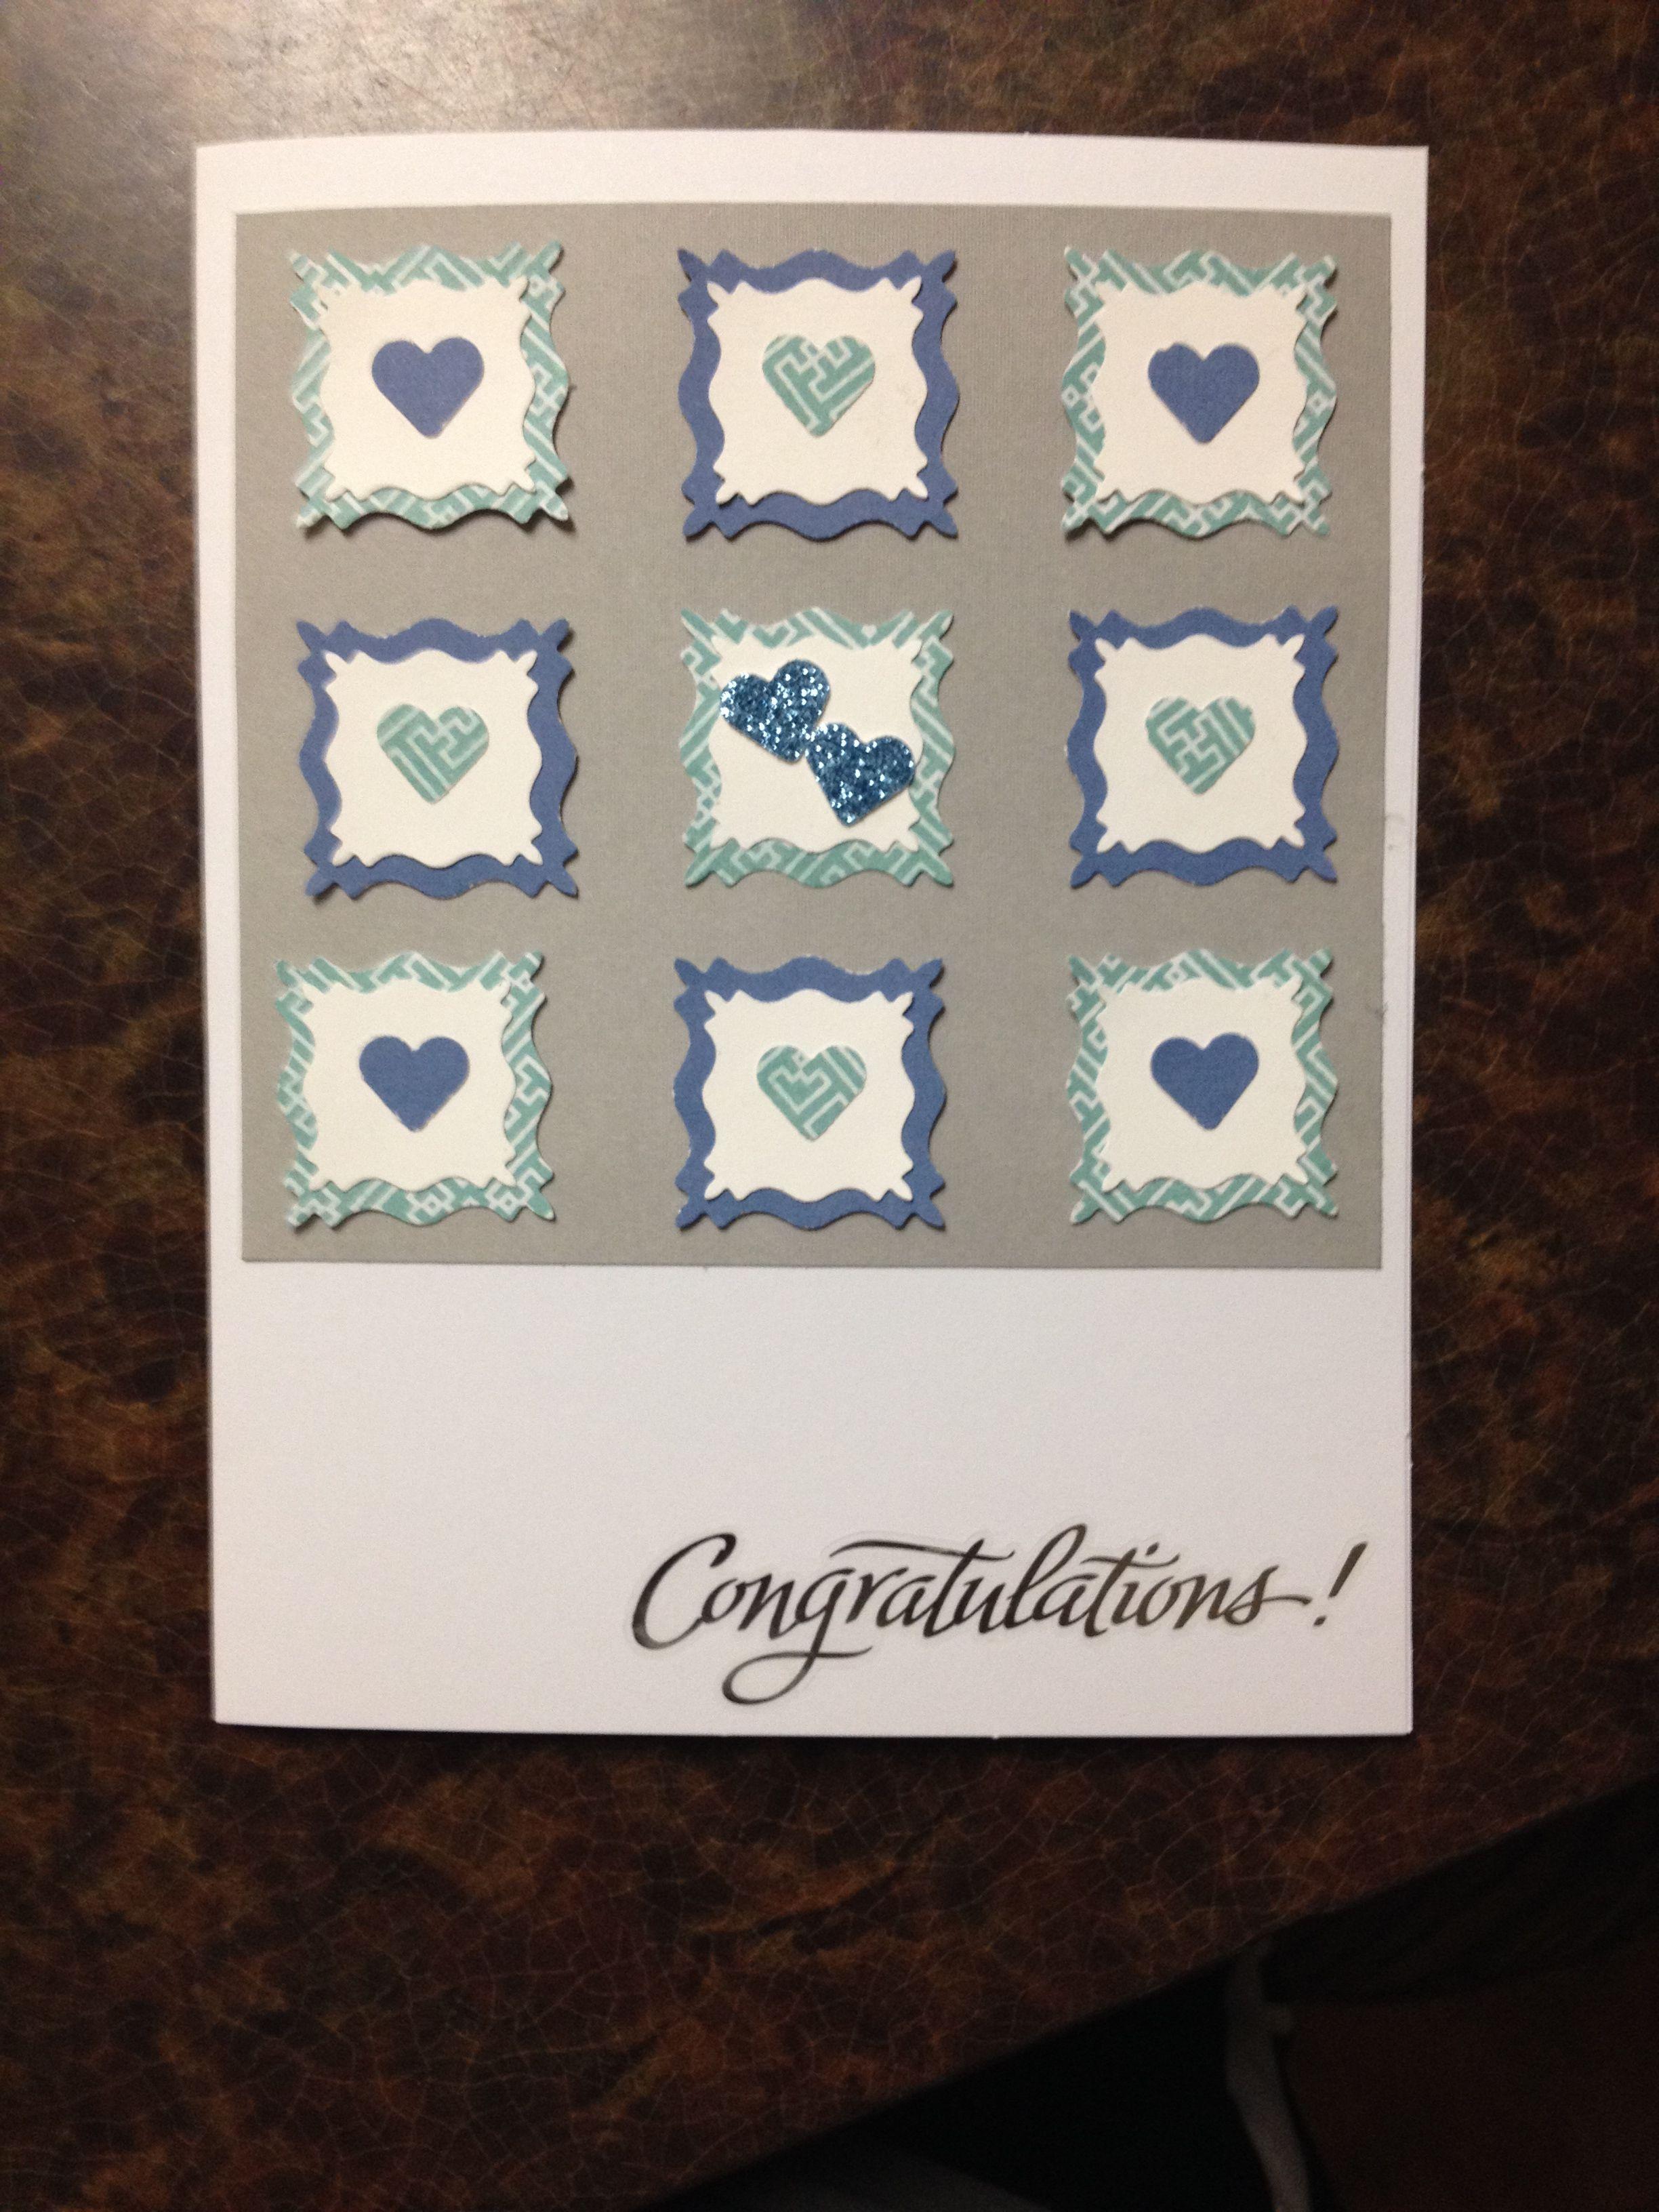 Congratulations wedding card diy wedding card diy